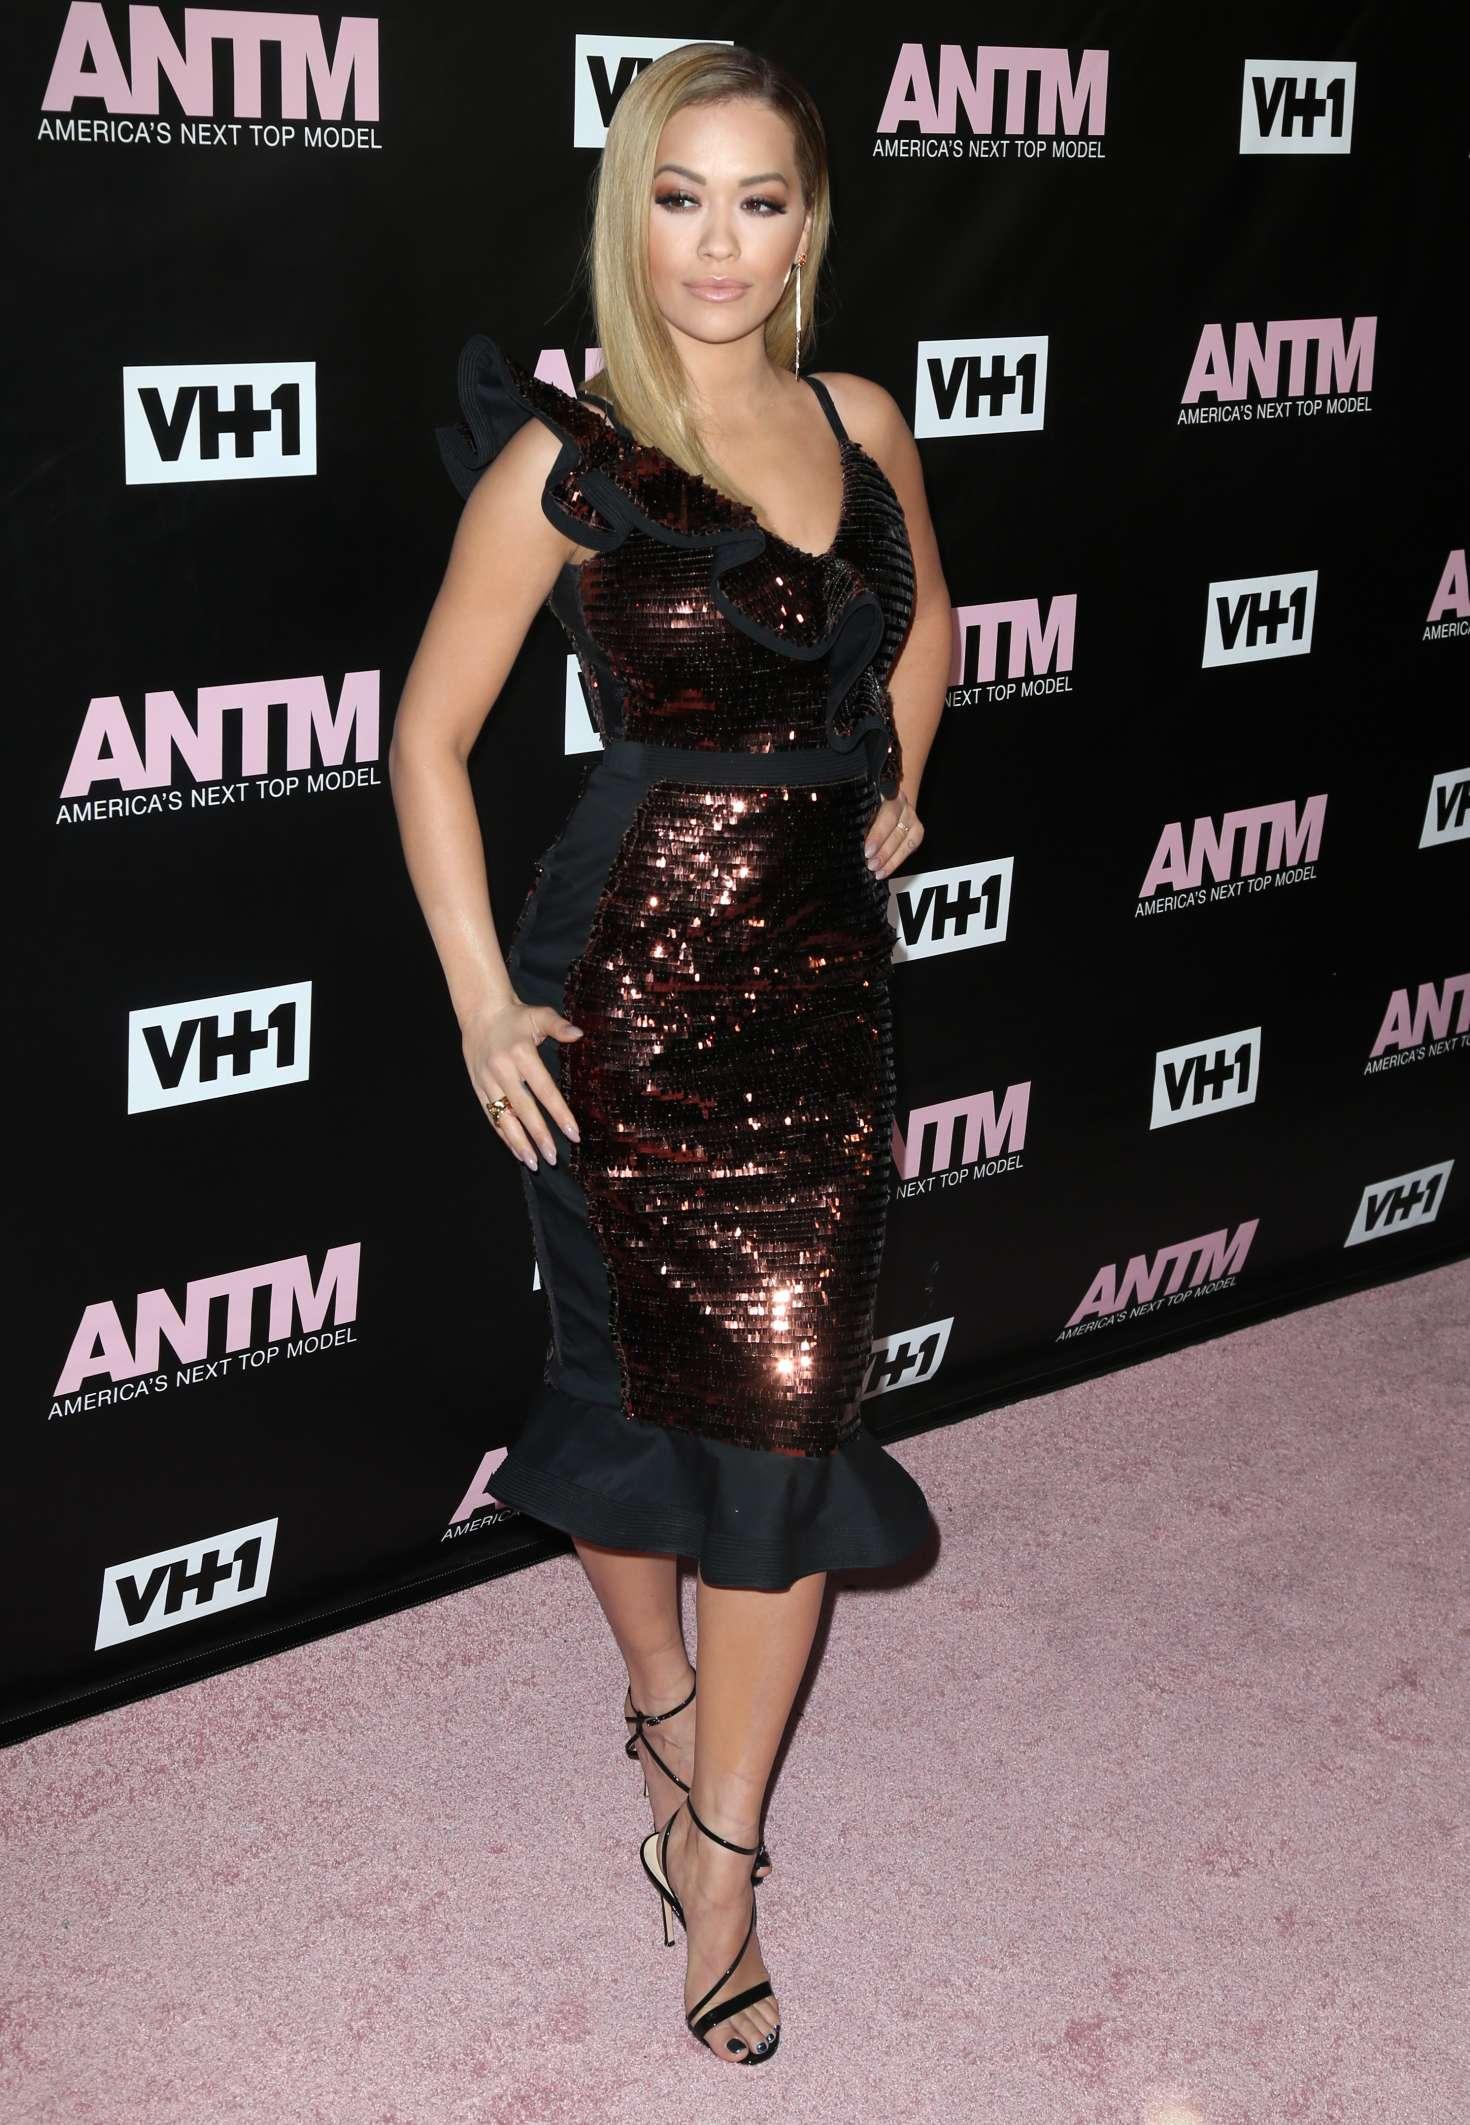 Rita Ora 2016 : Rita Ora: Americas Next Top Model Premiere Party -16